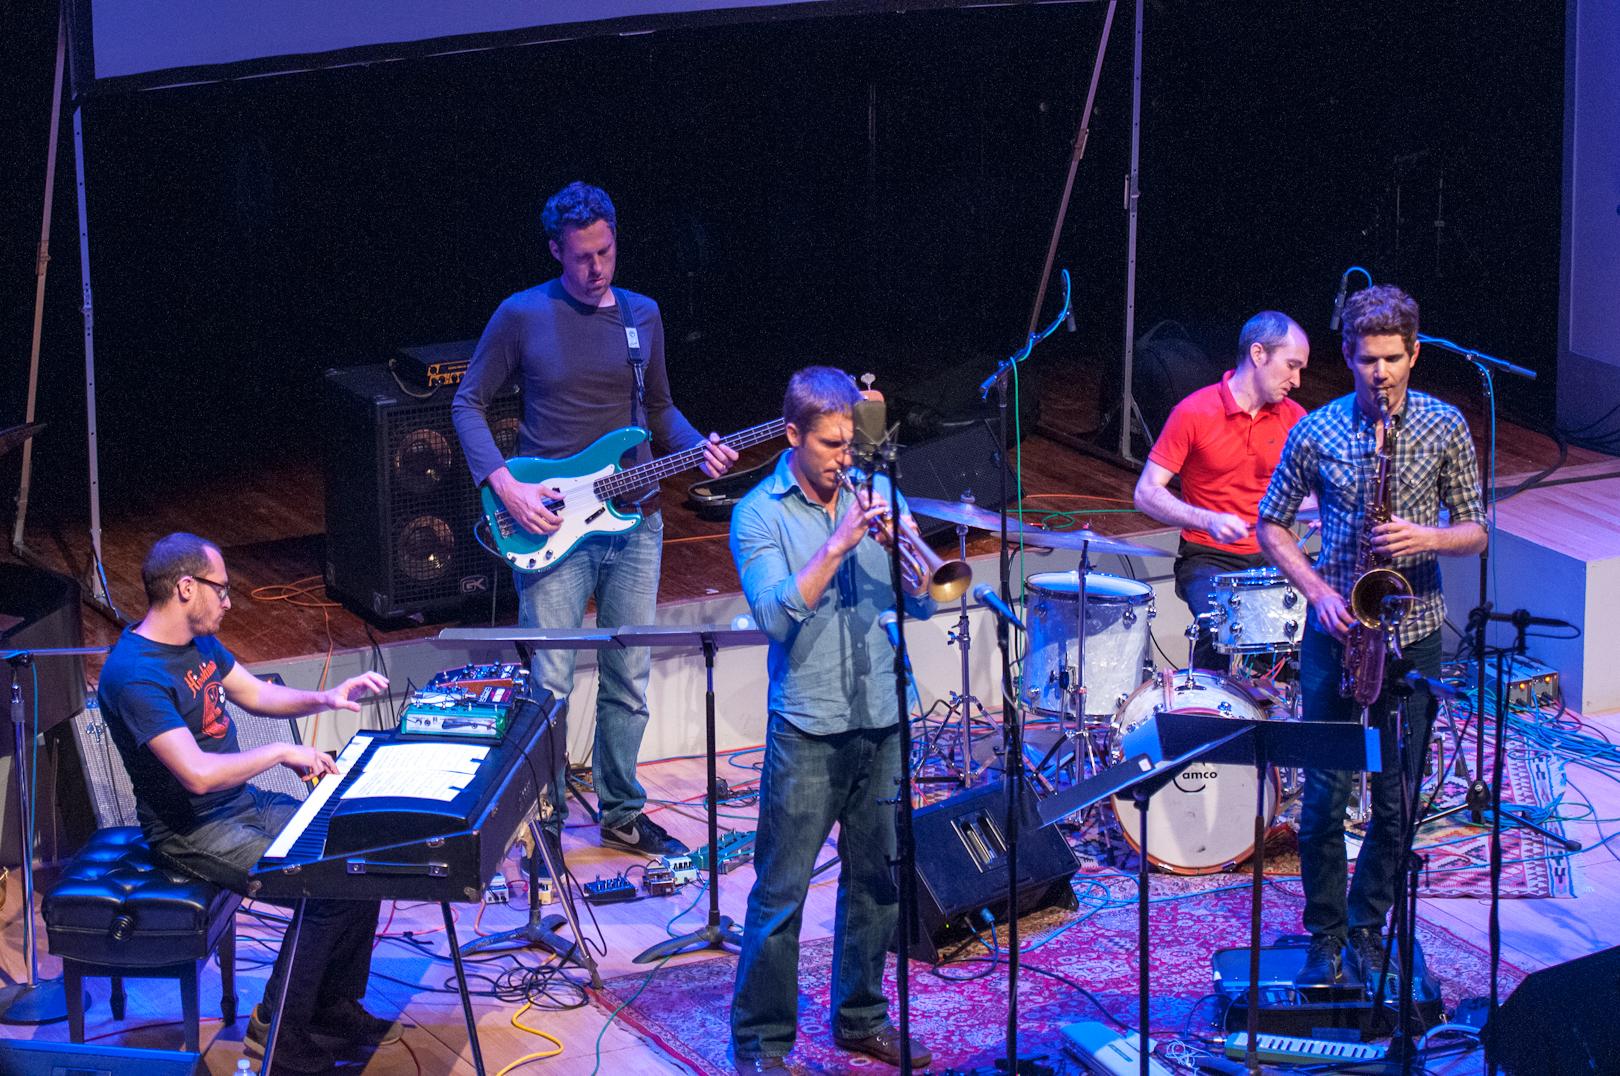 Shane Endsley, Adam Benjamin, Kaveh Rastegar, Nate Wood and Ben Wendel with Kneebody at the Vision Festival 2012